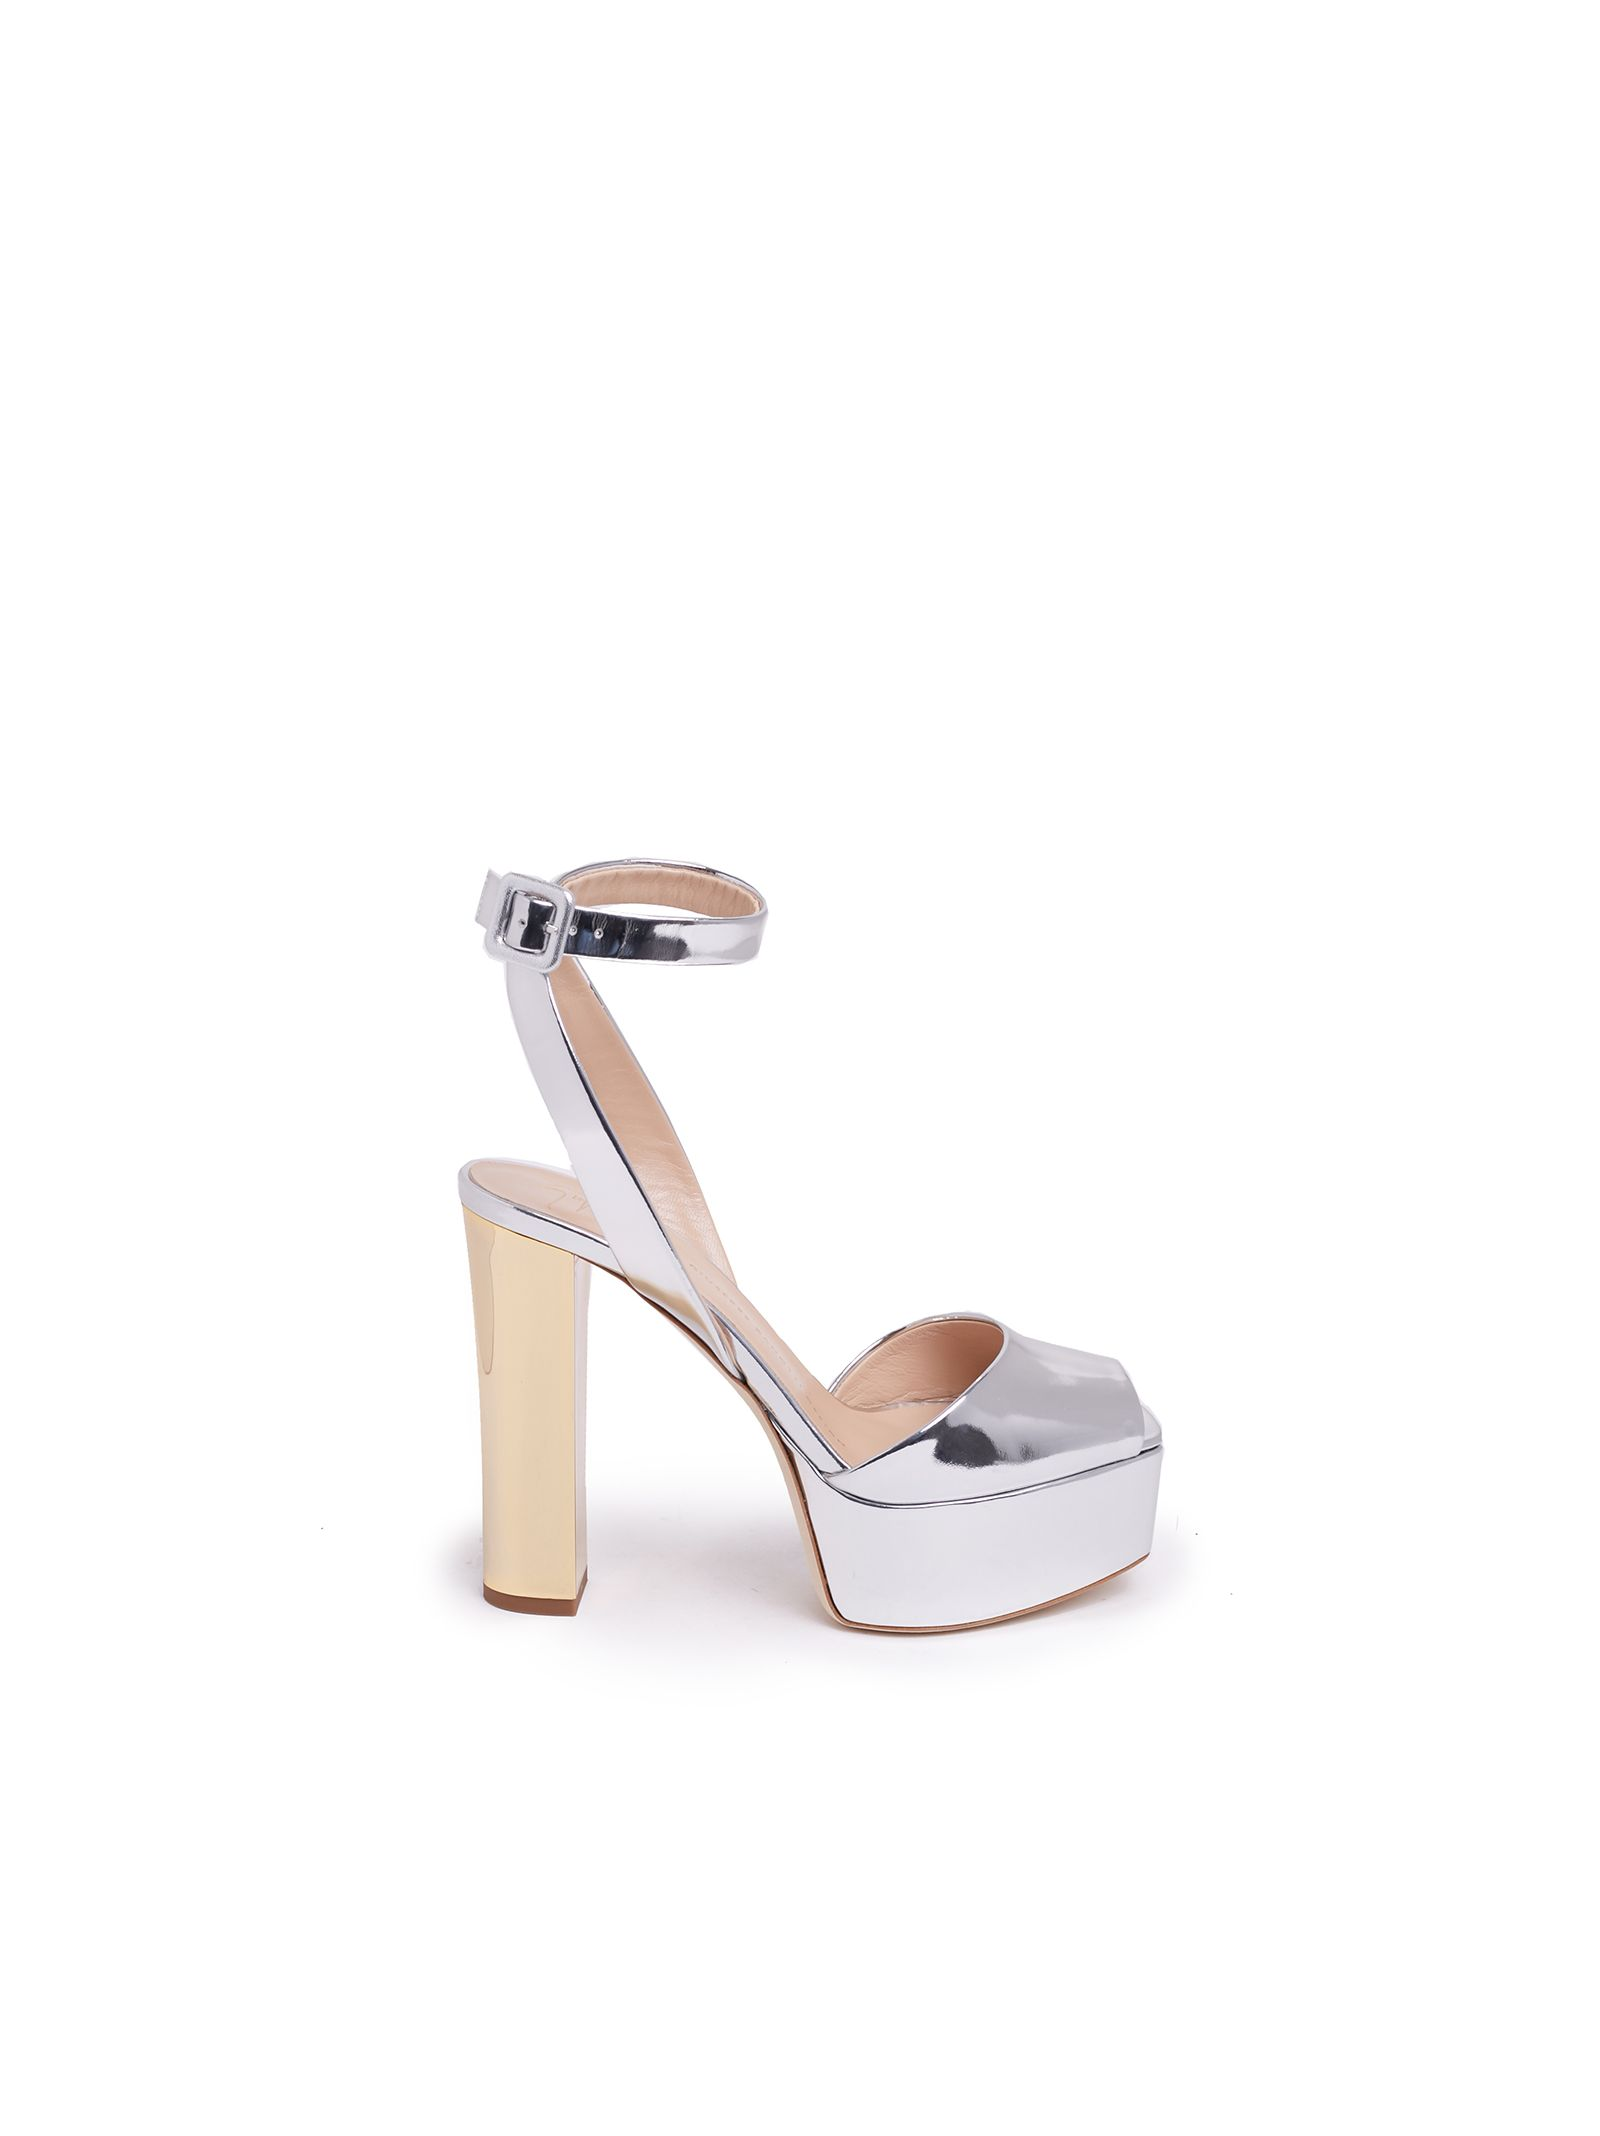 Giuseppe Zanotti Design Amelia Platform Sandals